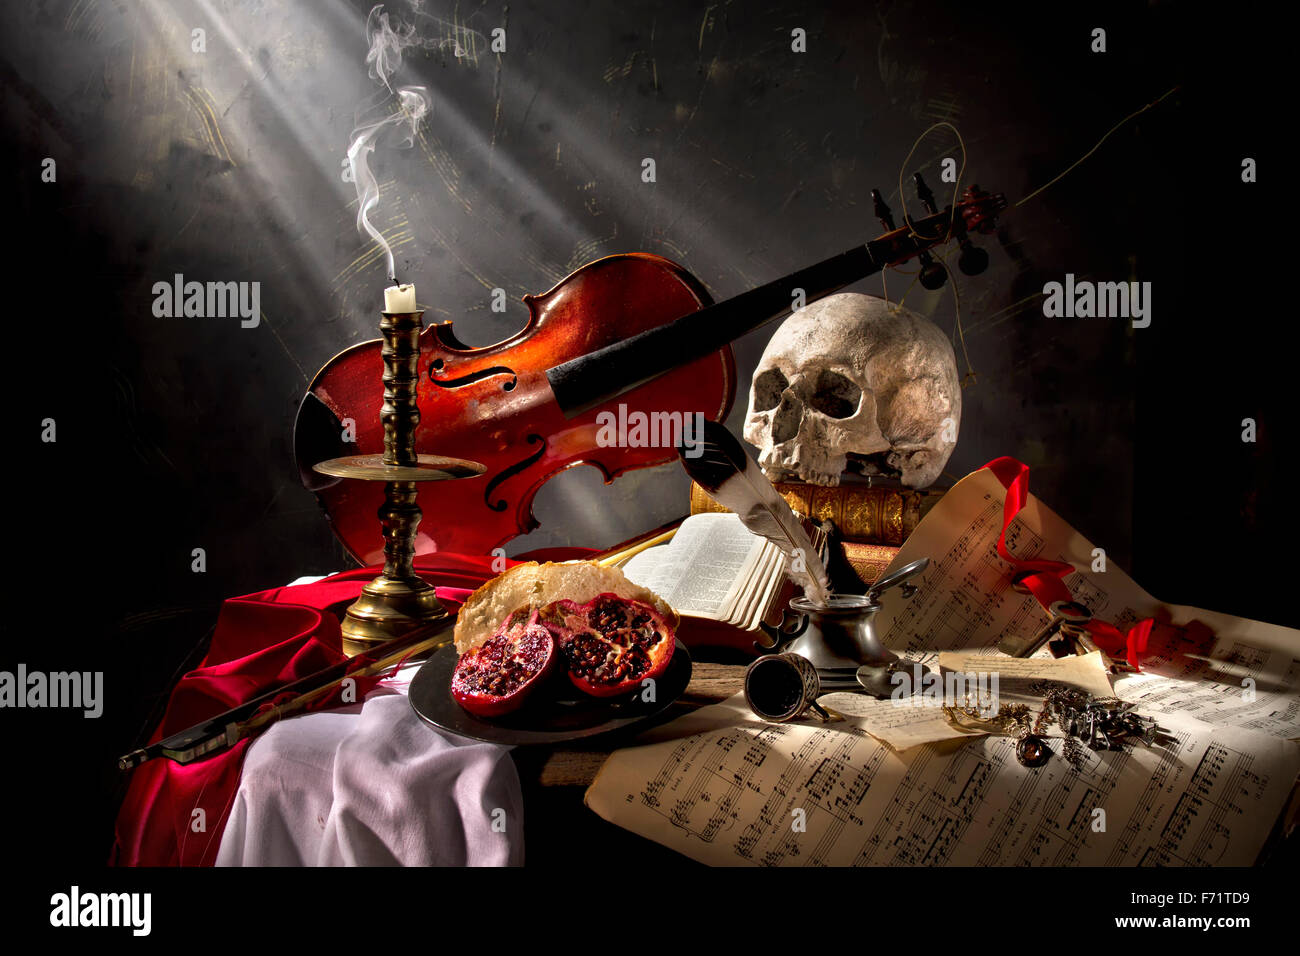 Silent Harmony - Vanitas still life composition Stock Photo